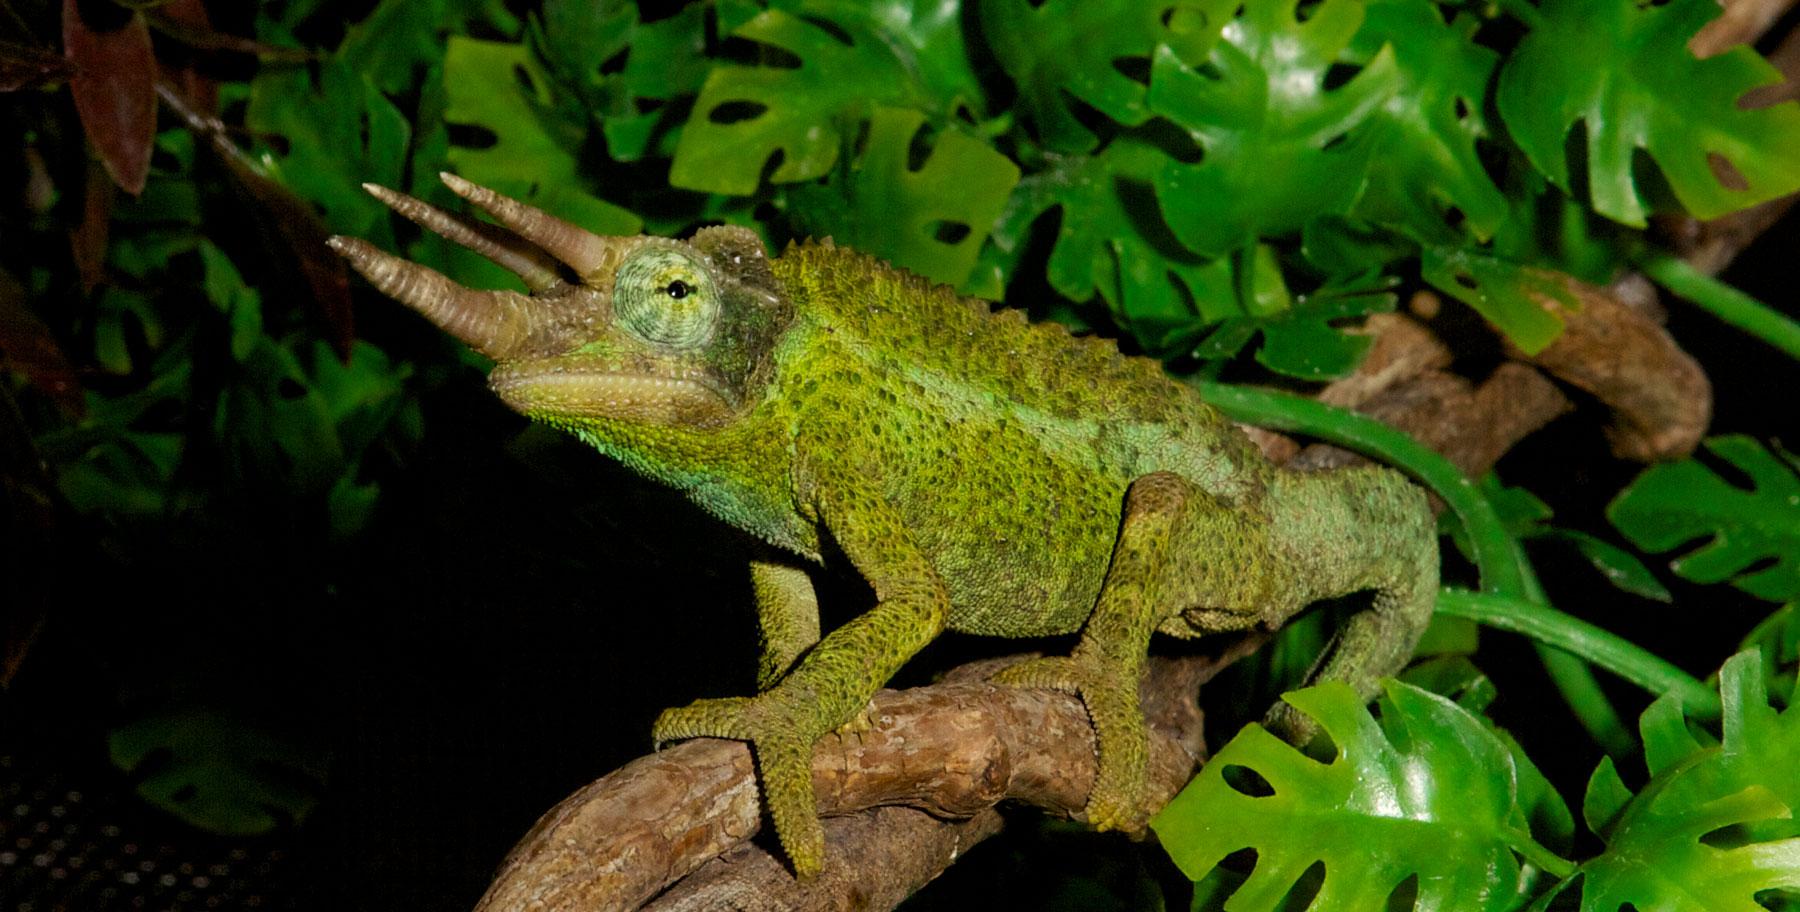 Jackson S Chameleon Zoo Med Laboratories Inc